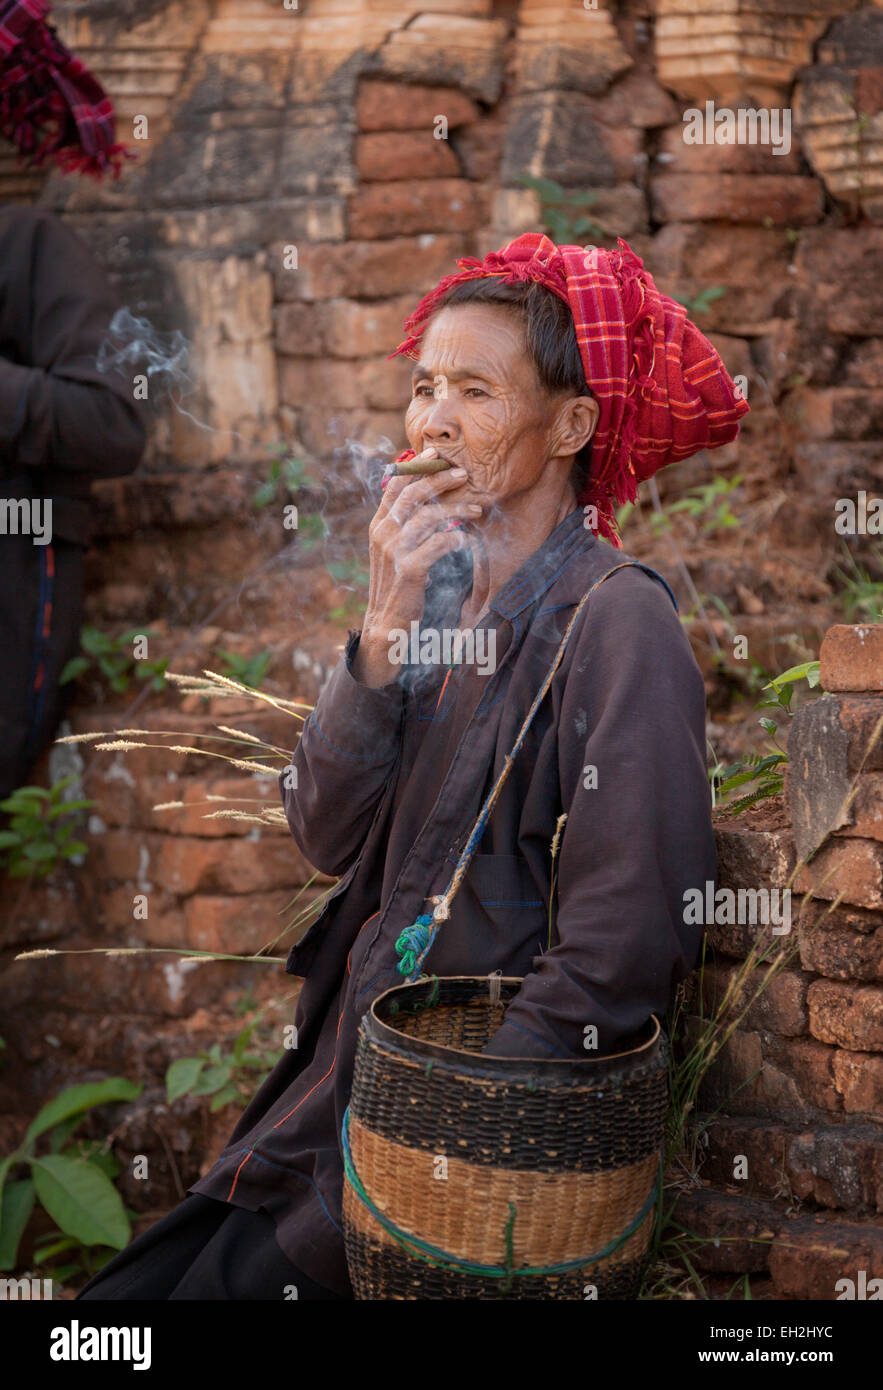 A burmese woman smoking a cigar, Inle lake, Myanmar ( Burma ), Asia - Stock Image